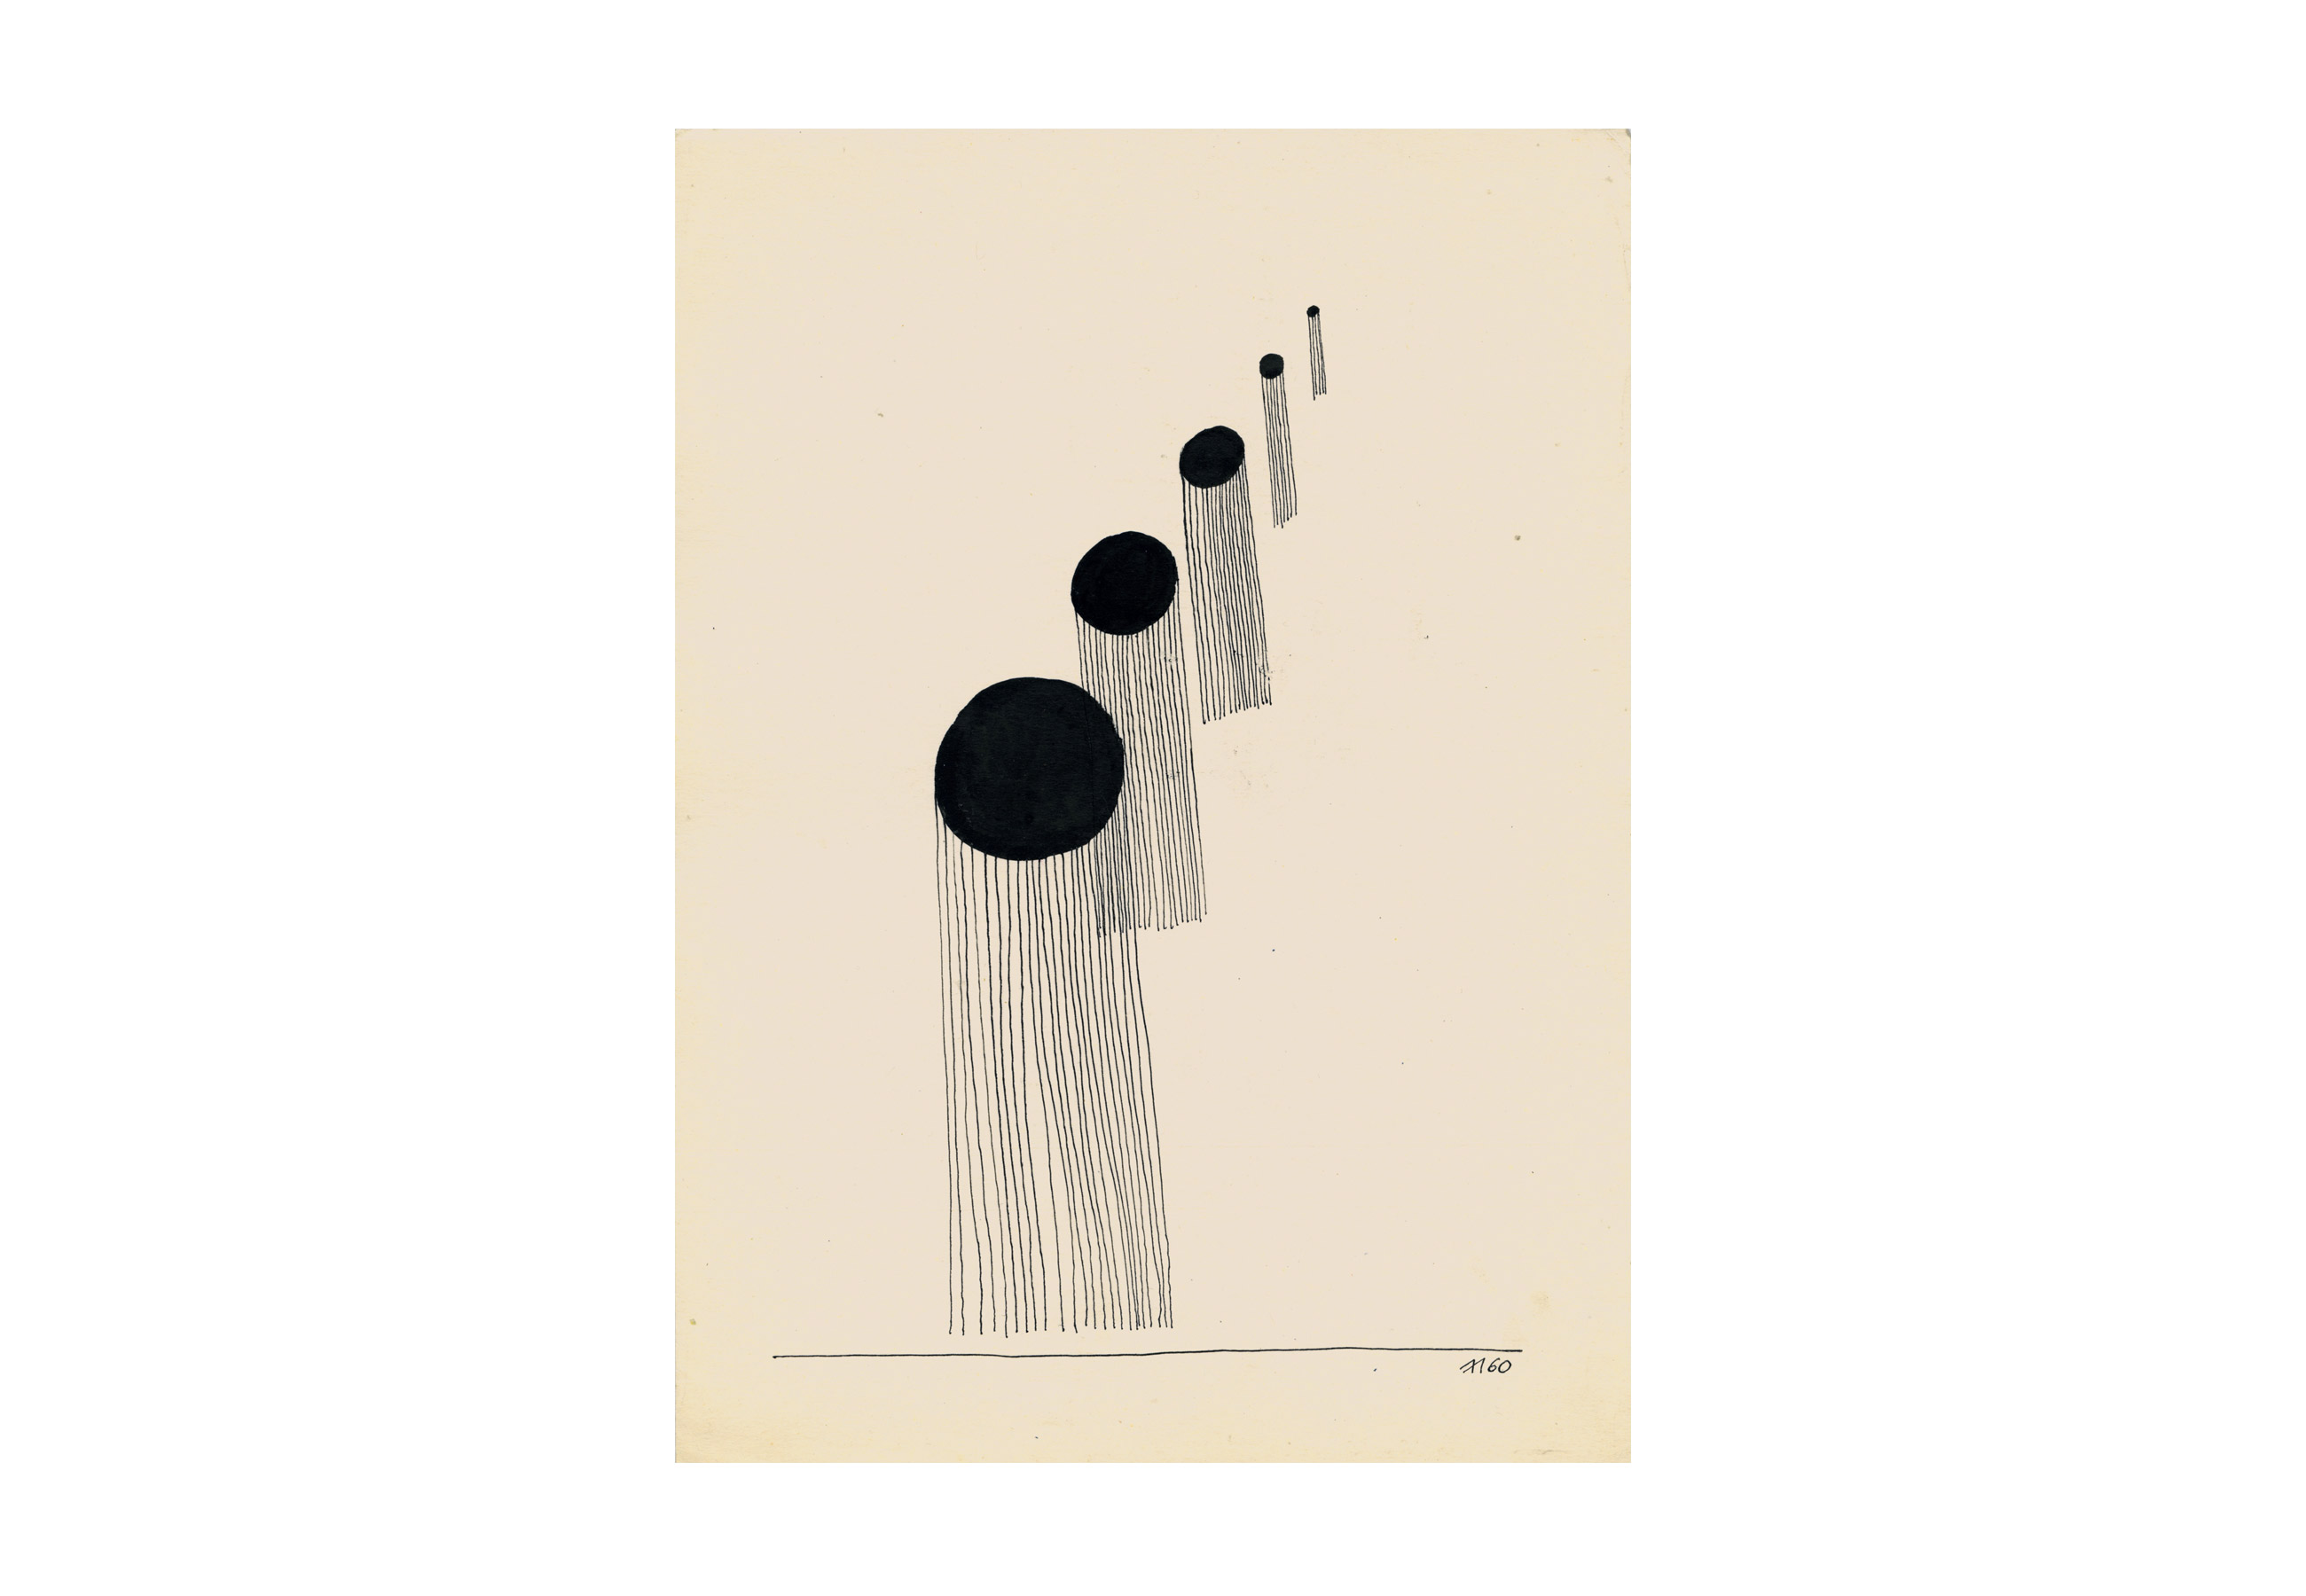 Lamm-Portfolio-1960-69-10.jpg